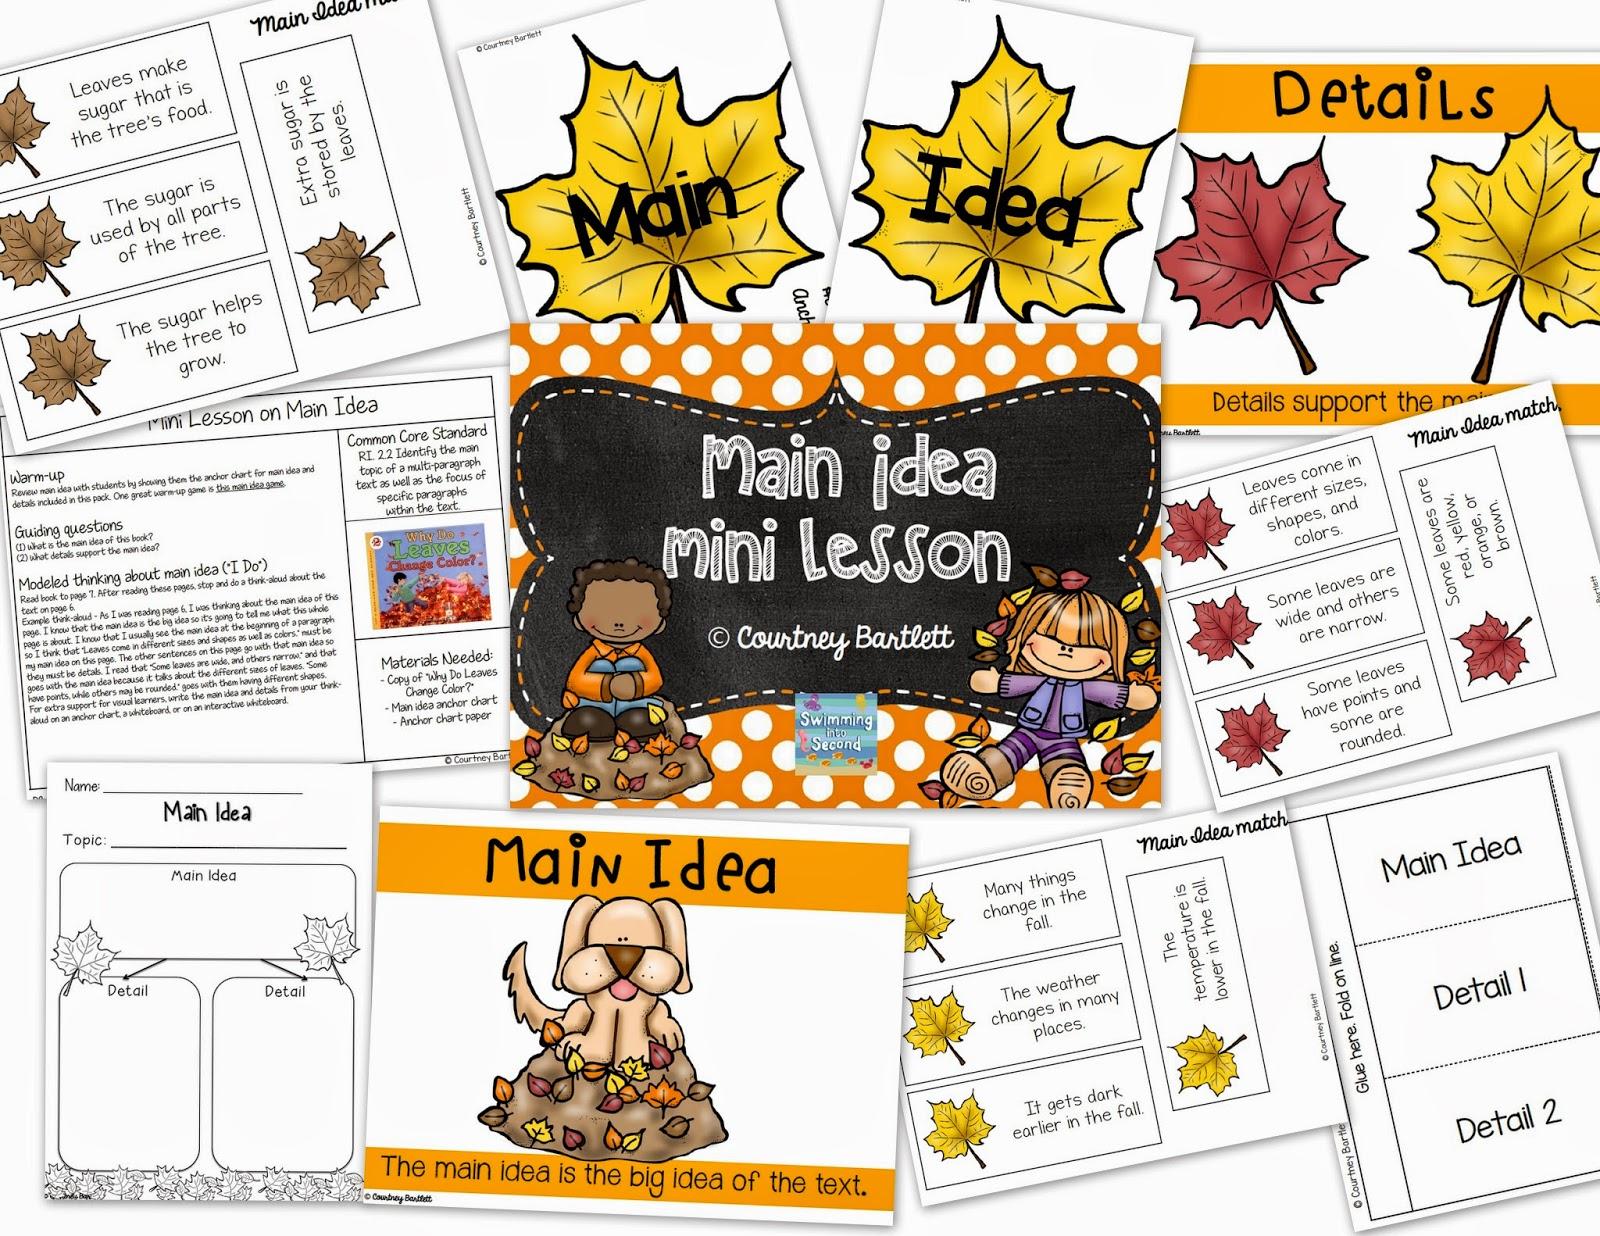 http://www.teacherspayteachers.com/Product/Main-Idea-mini-lesson-with-Why-Do-Leaves-Change-Color-1498651